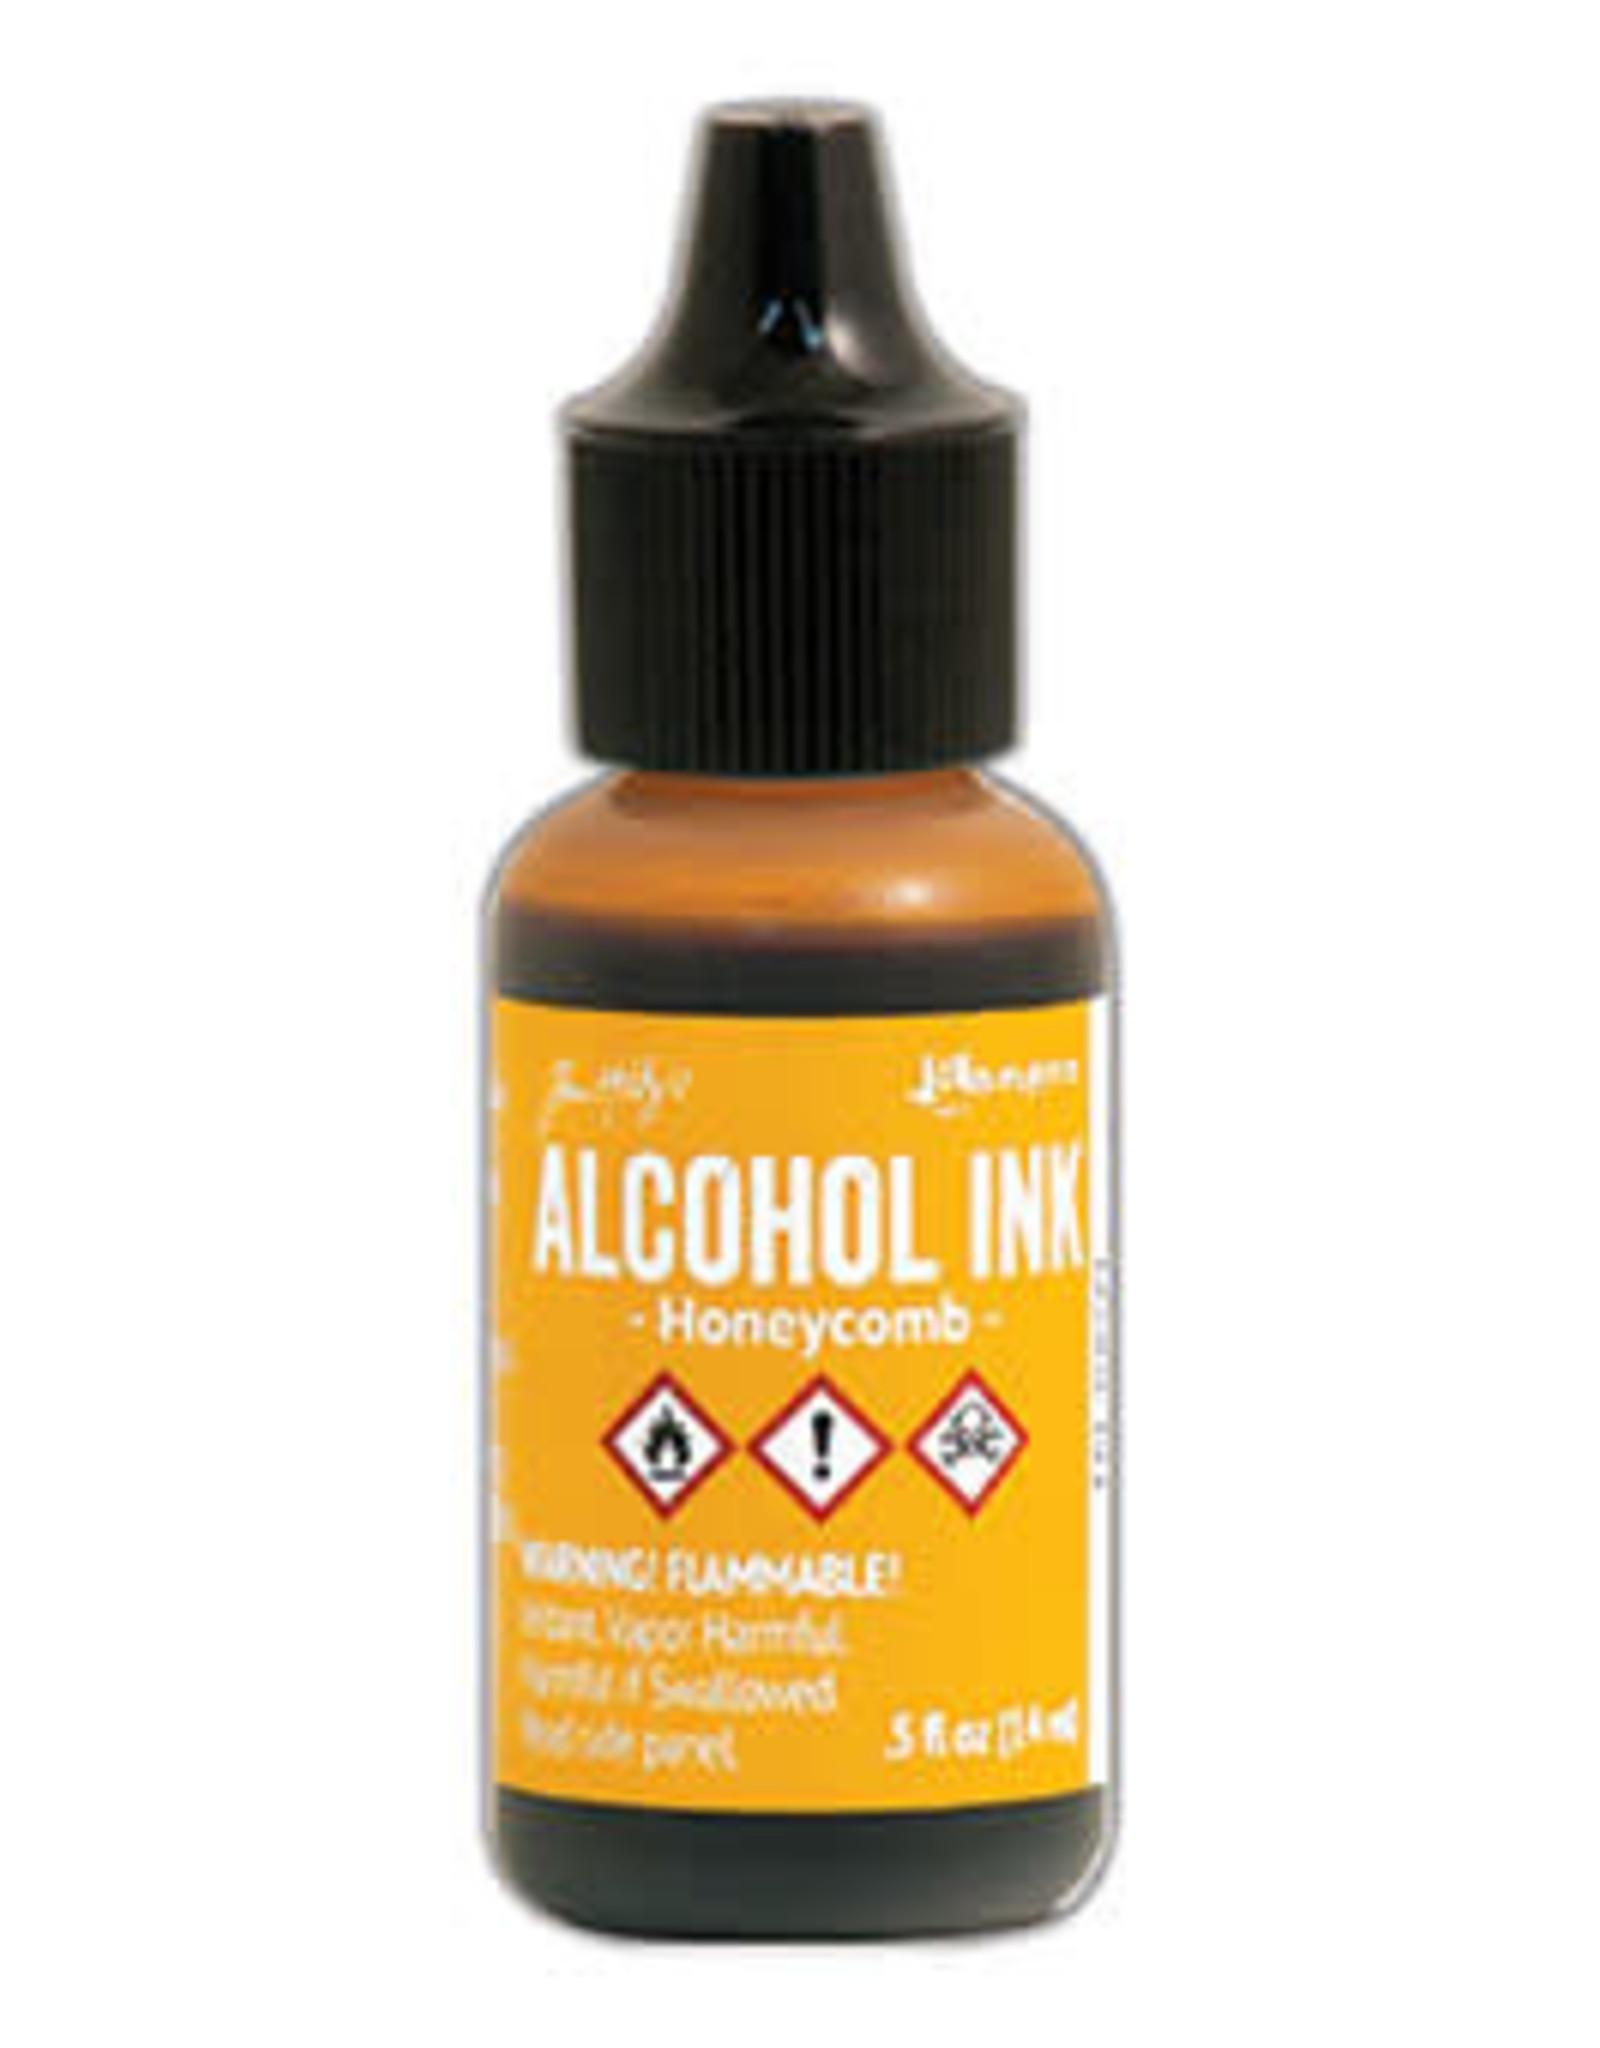 Tim Holtz Alcohol Ink 1/2 oz Honeycomb